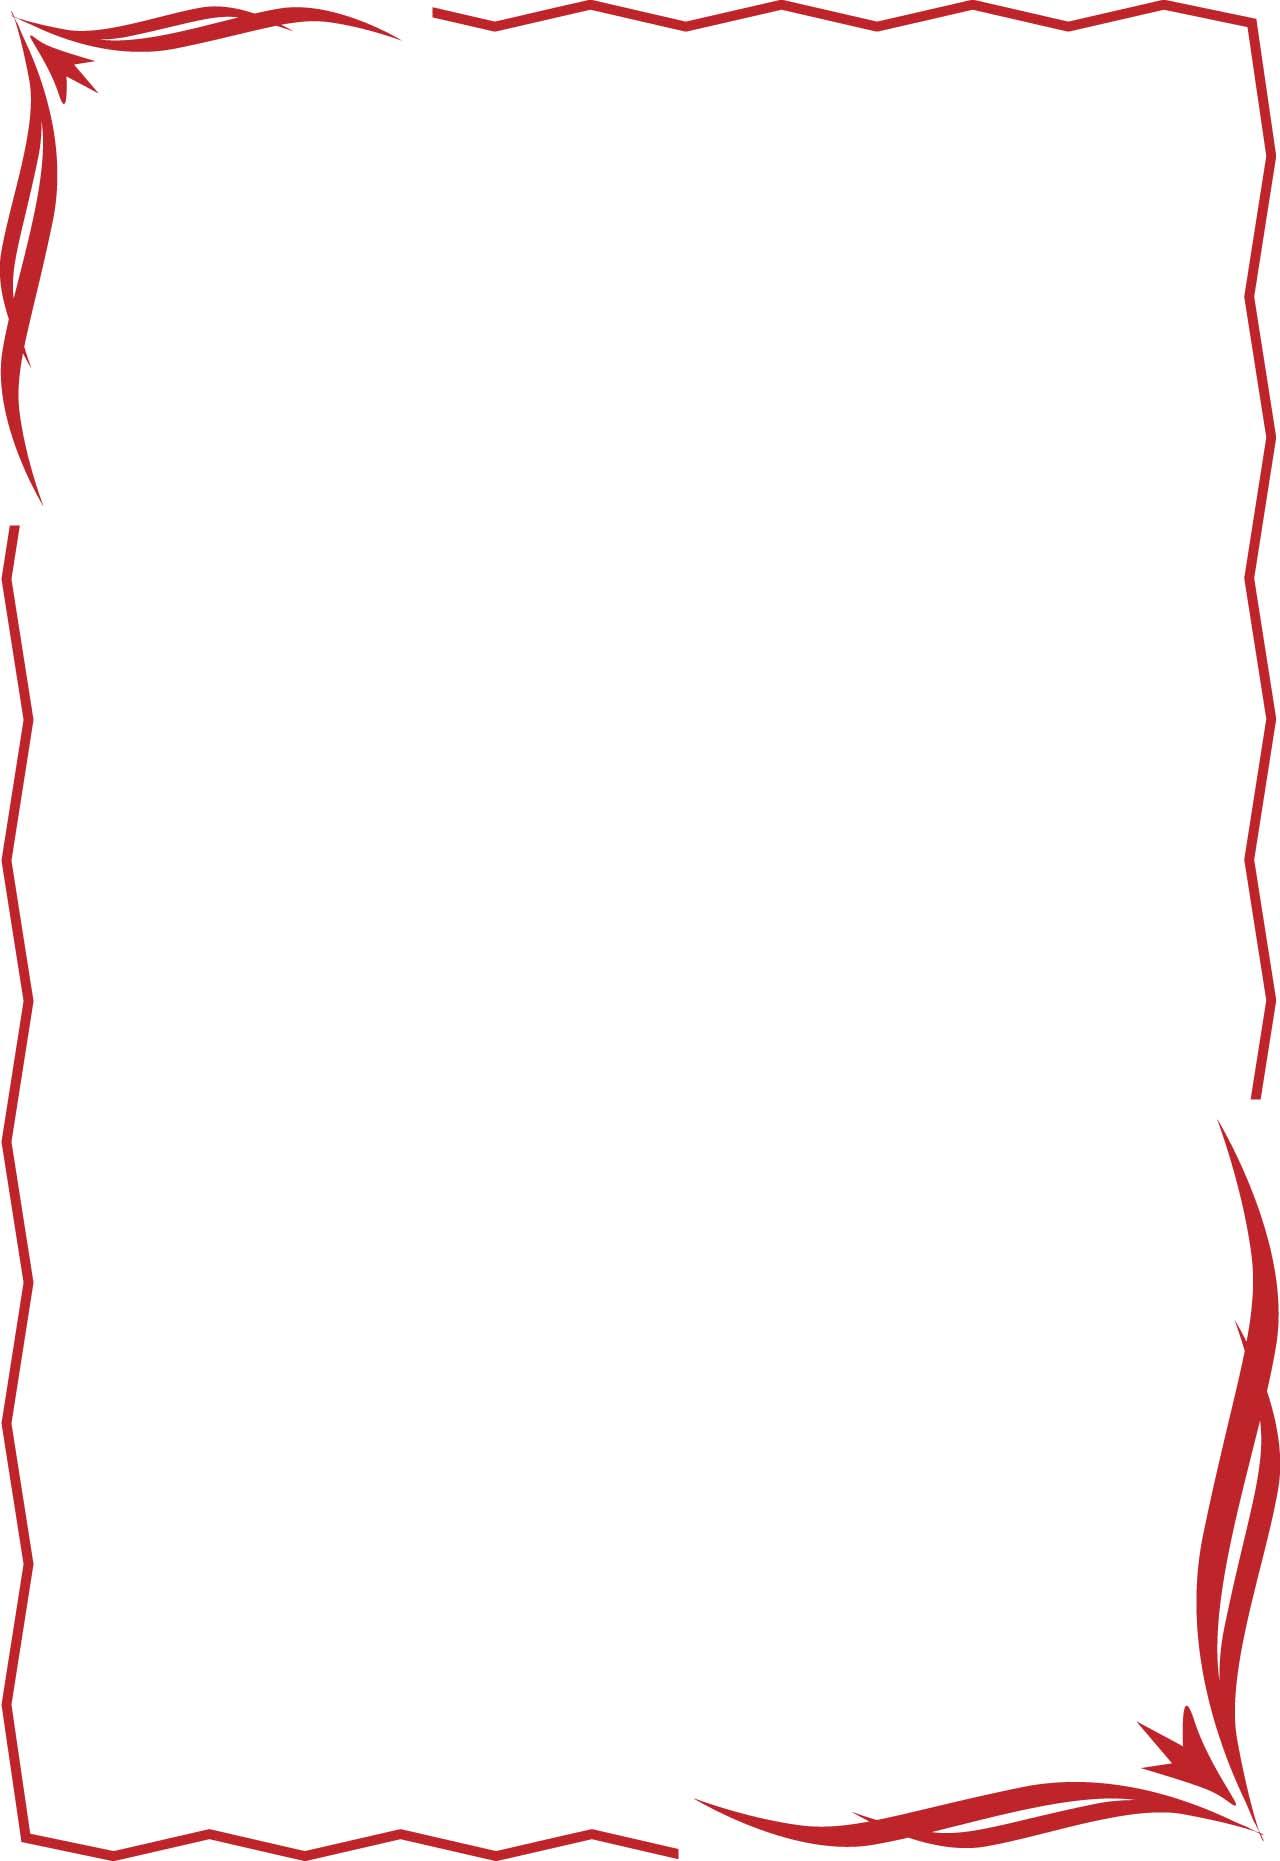 Fancy Red Ribbon Border Vector